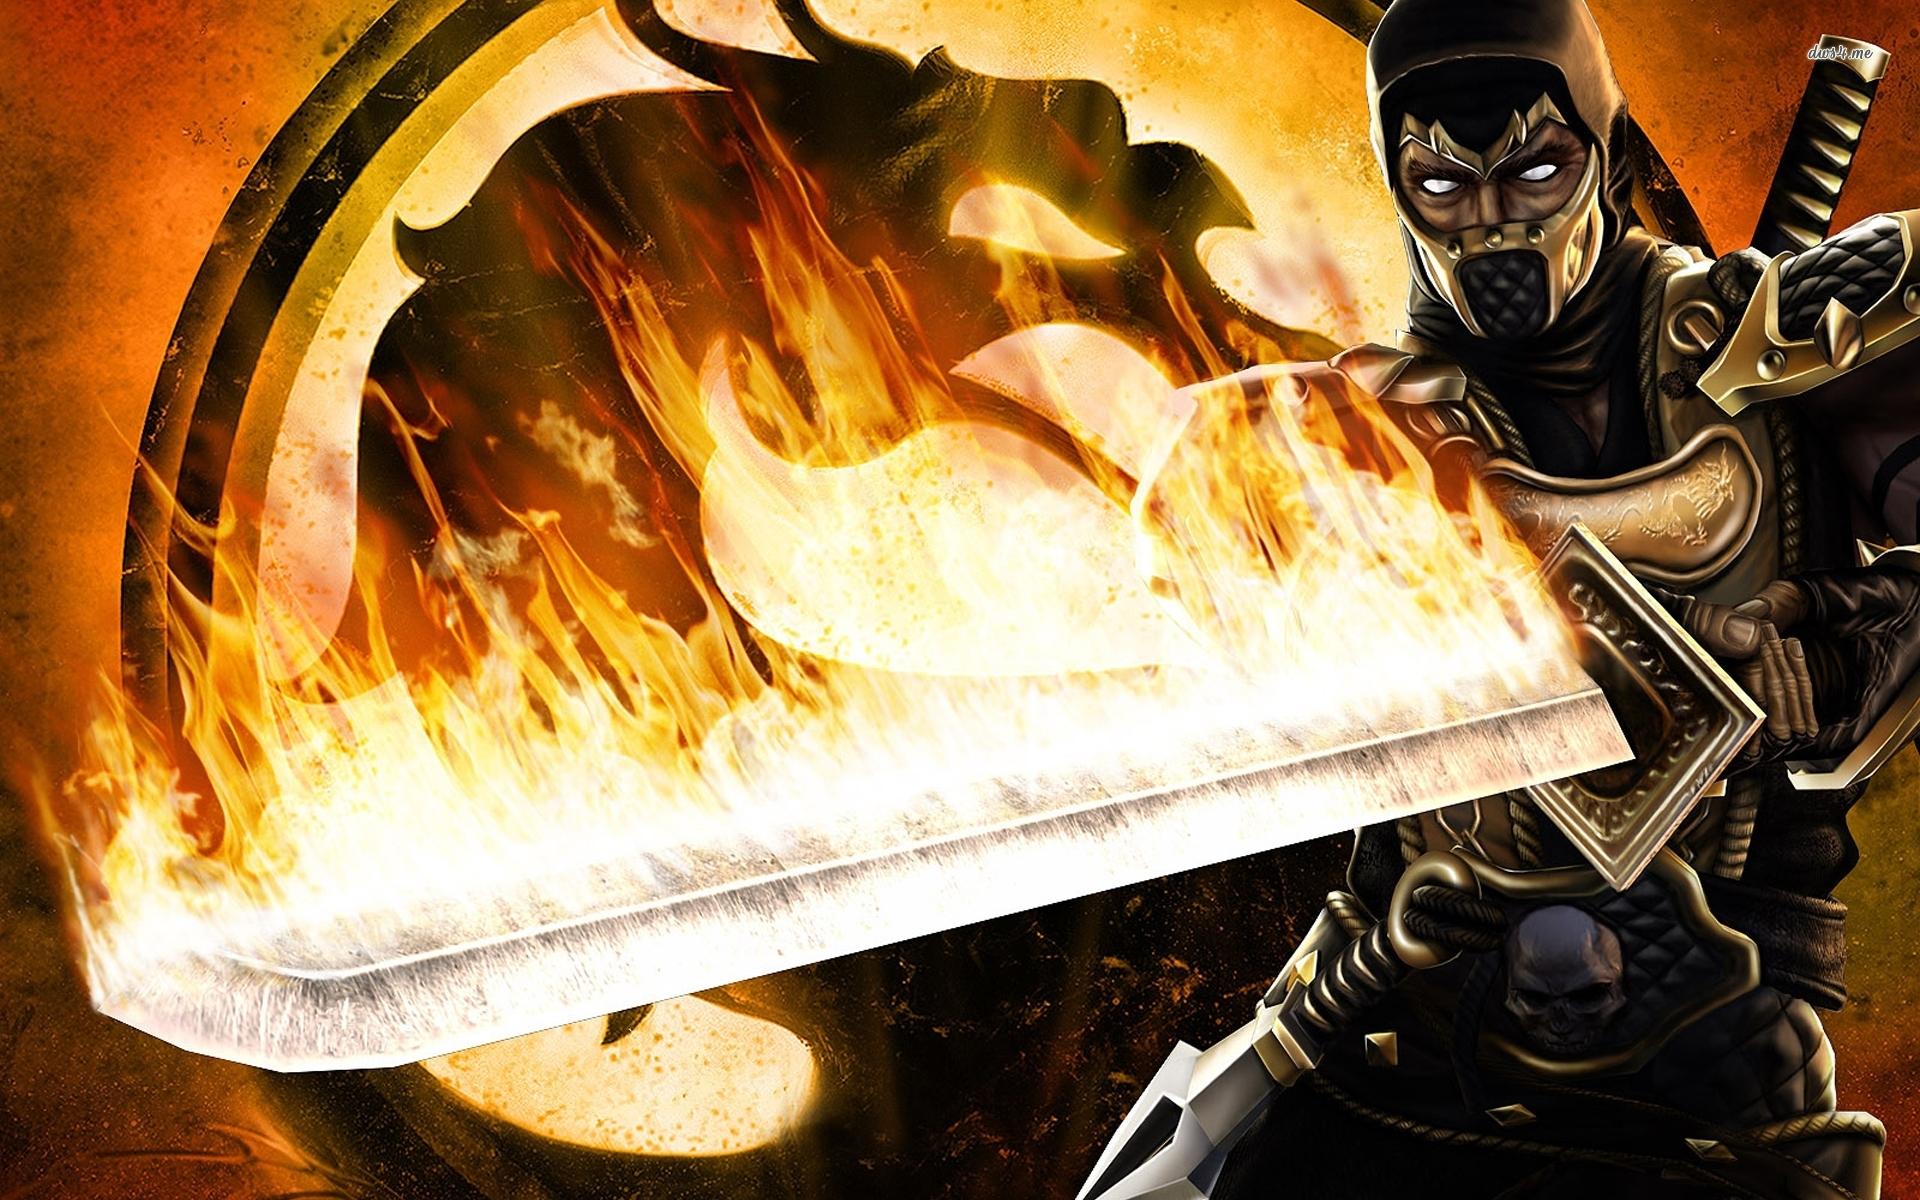 Scorpion Mortal Kombat 1 1920x1200 Download Hd Wallpaper